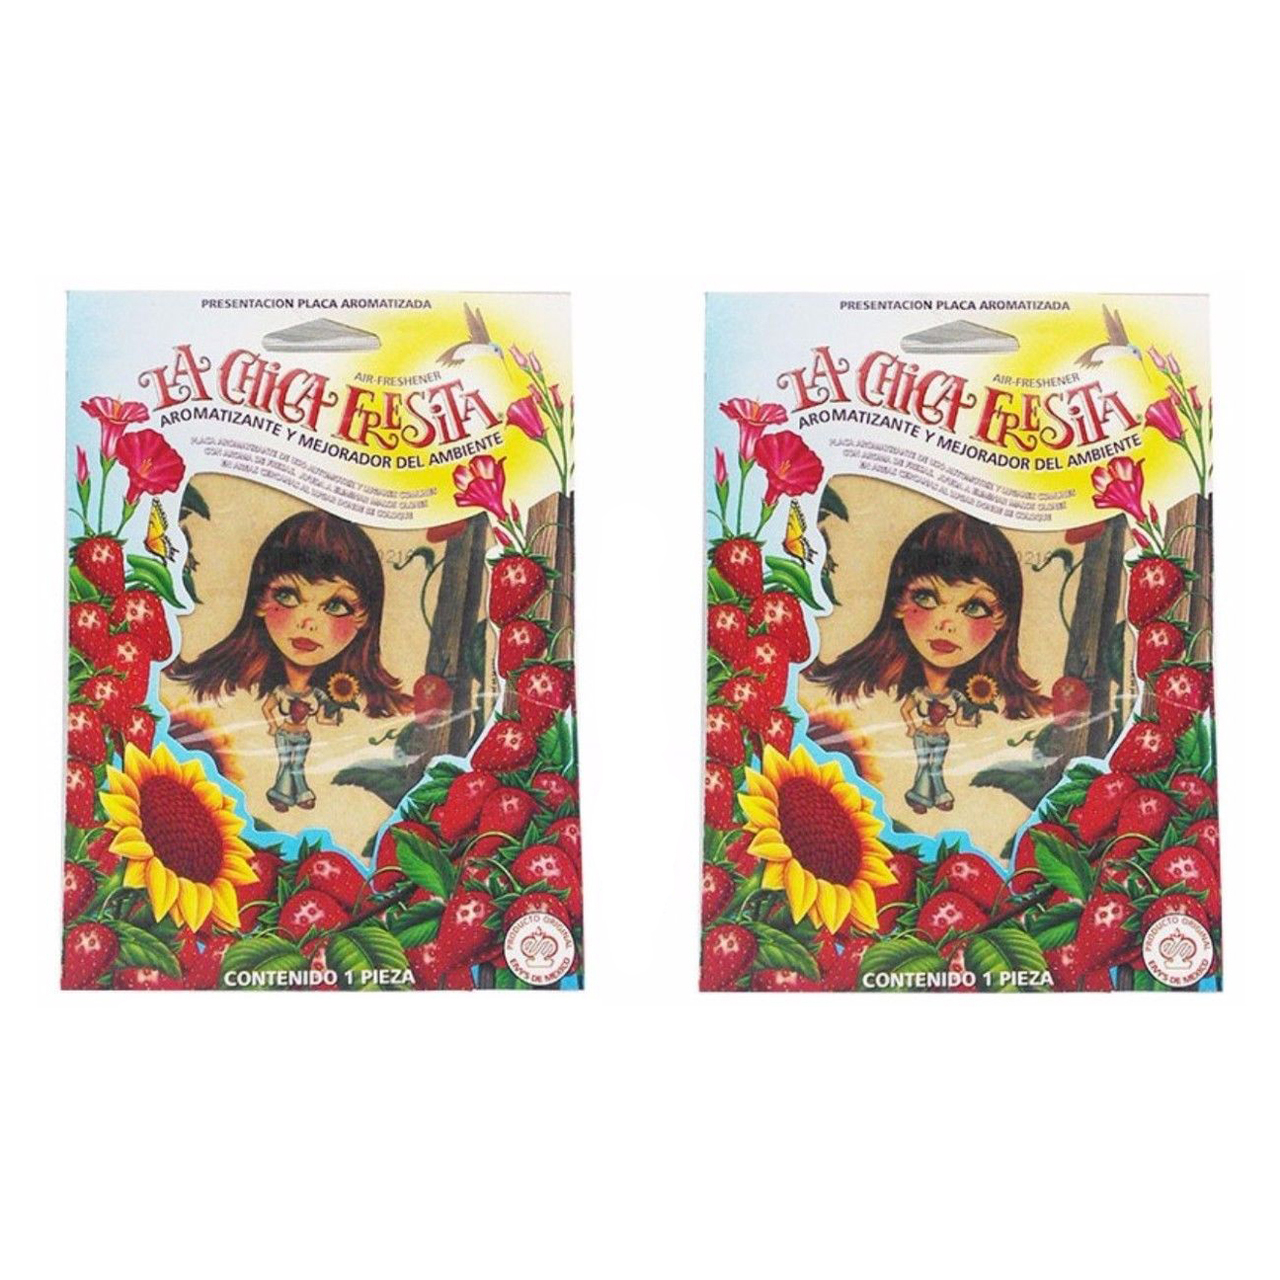 Car Air Freshener Deodorant with Strawberry Scent (2 PCS) - La Chica Fresita